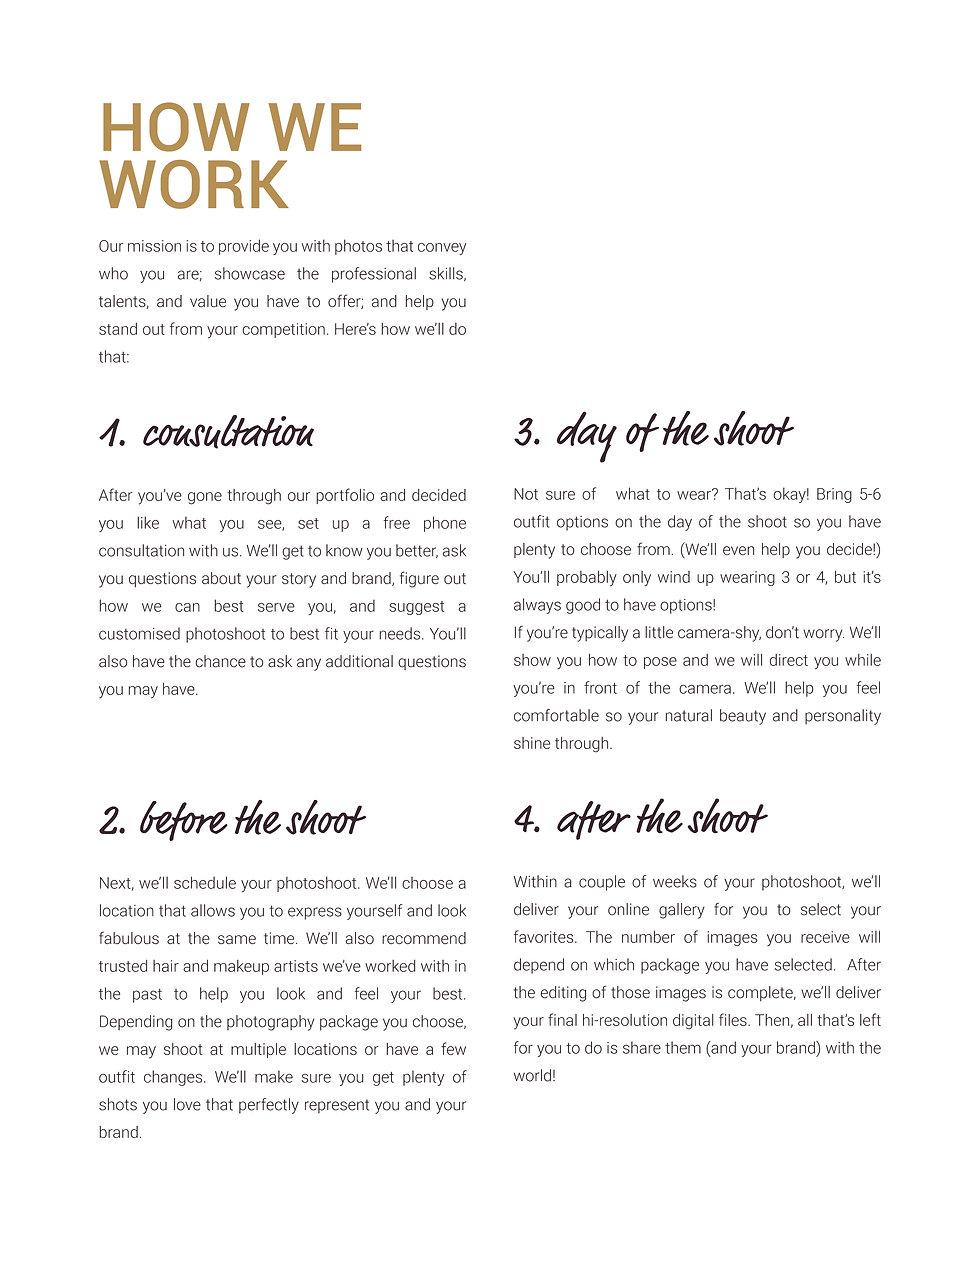 Personal Brand Magazine Vol 2 Page 04 co